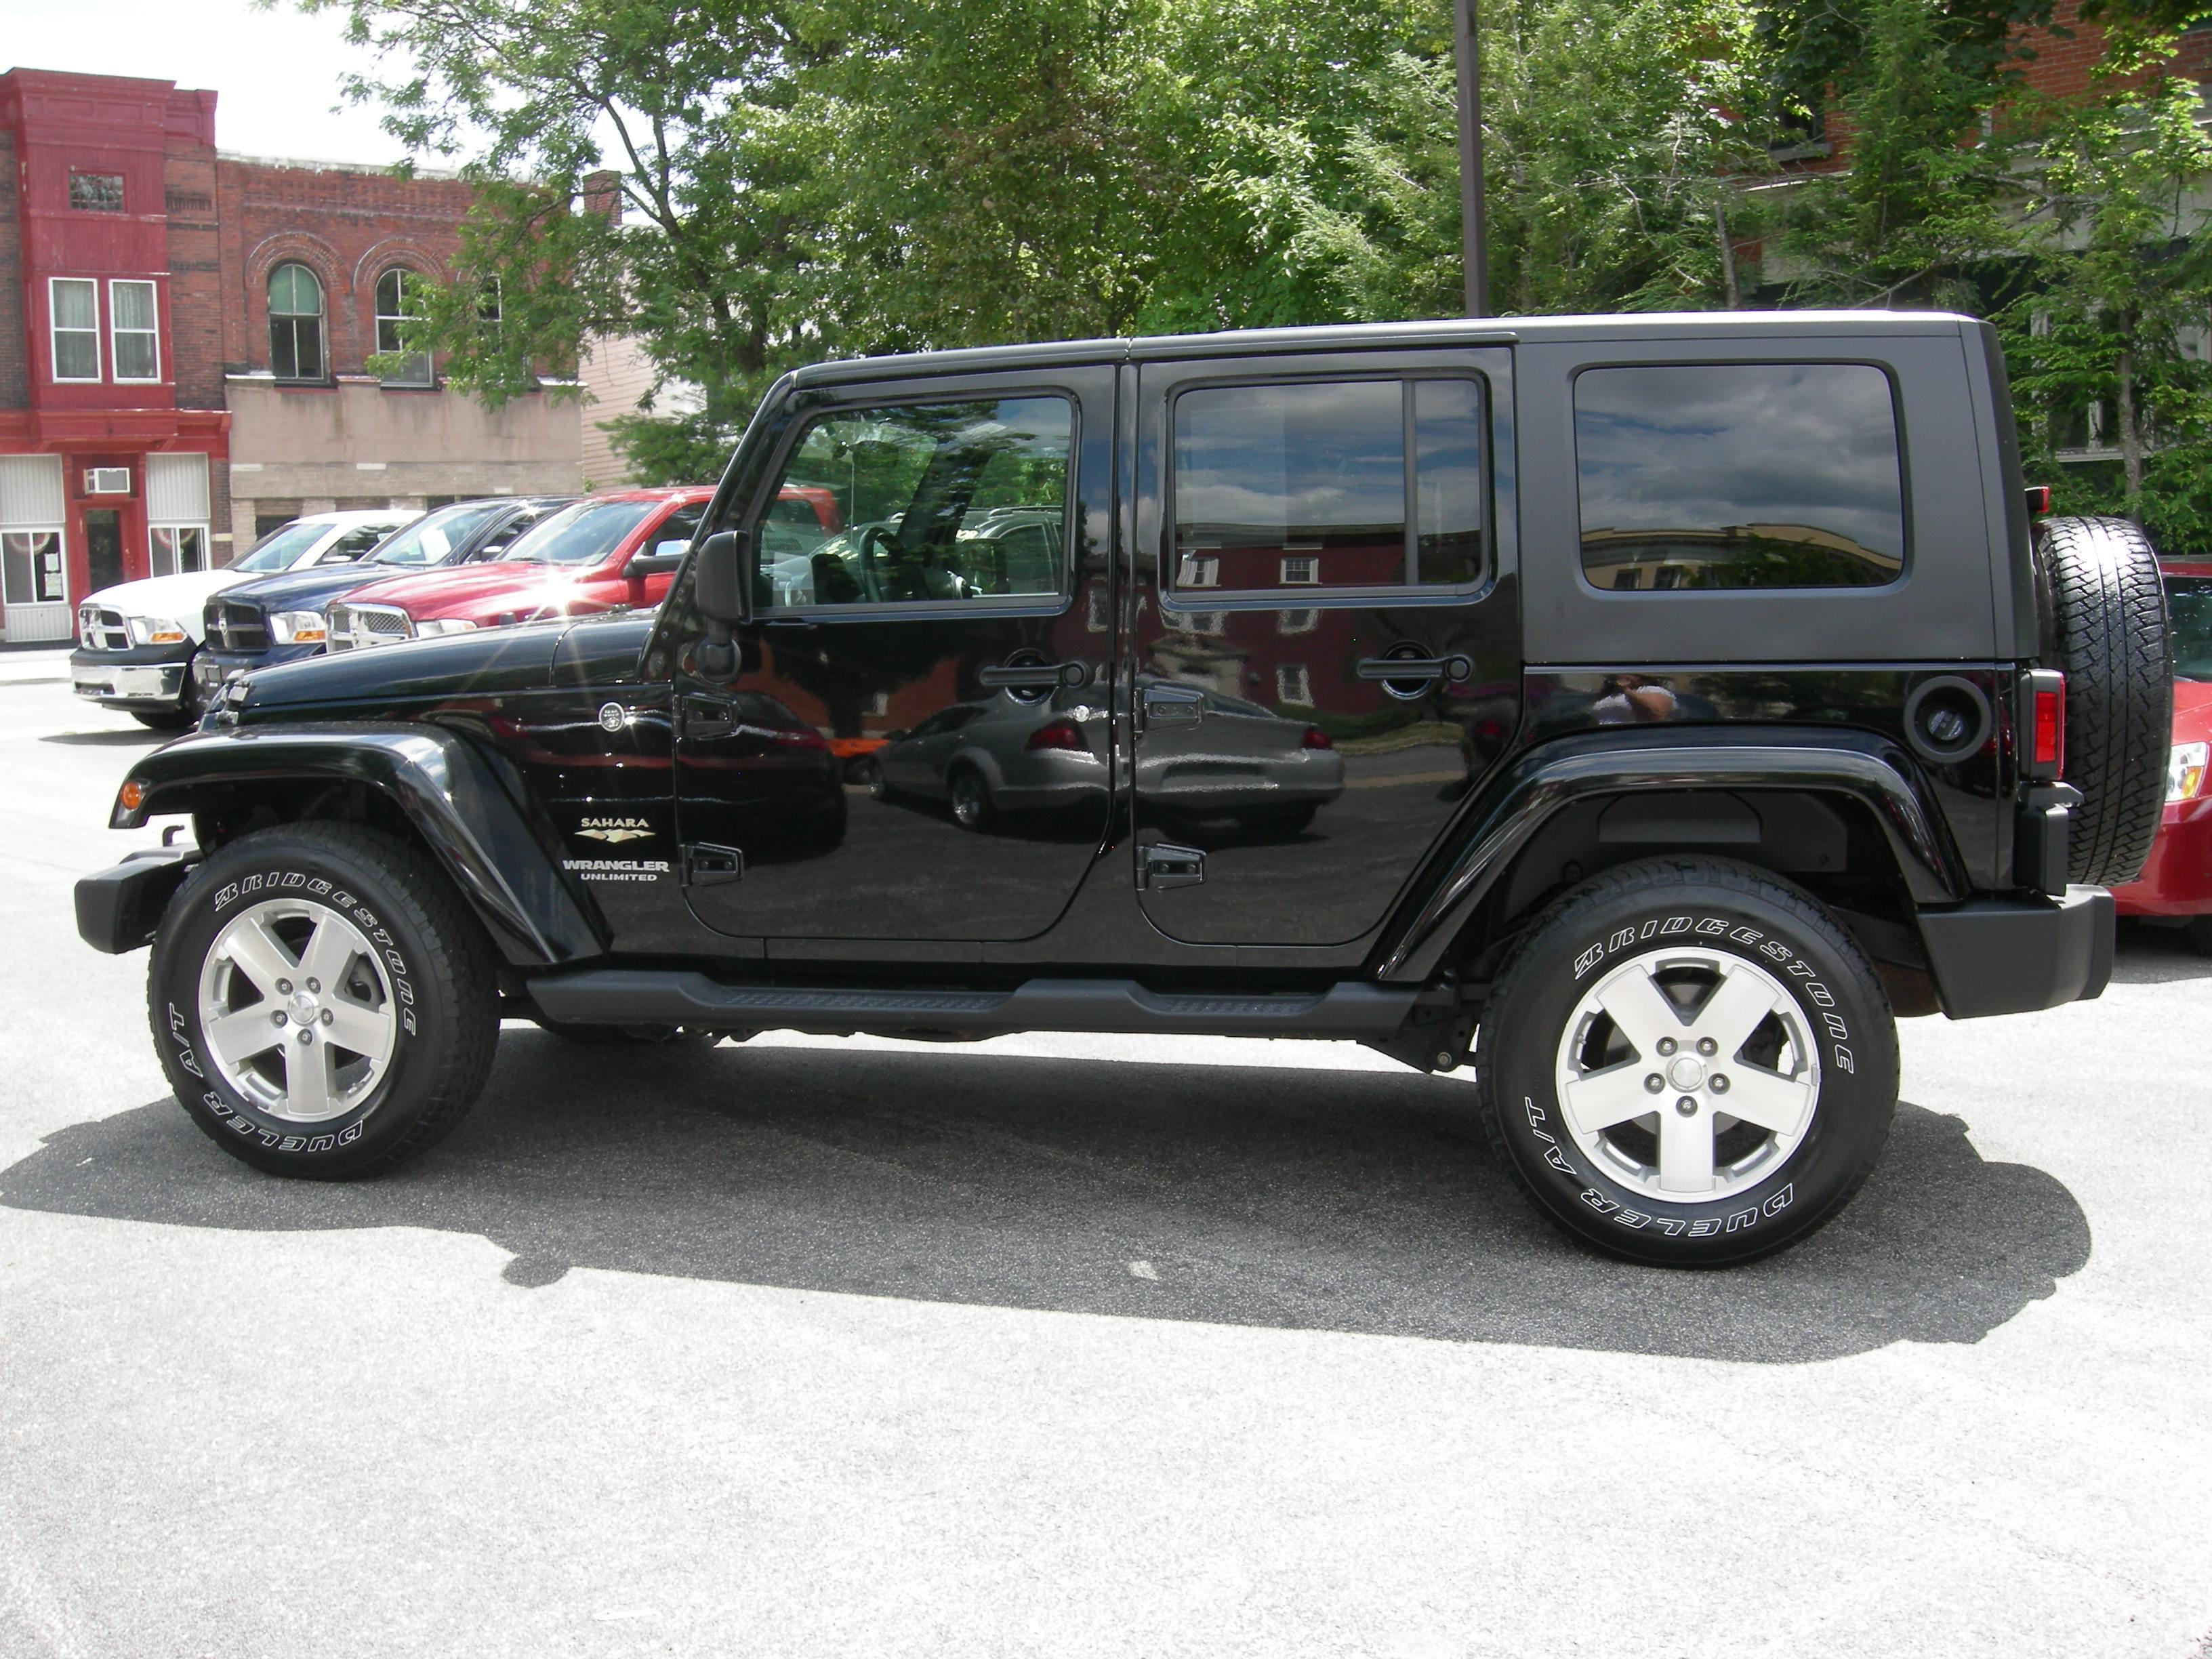 jeep wrangler unlimited sahara picture 6 reviews news specs buy car. Black Bedroom Furniture Sets. Home Design Ideas